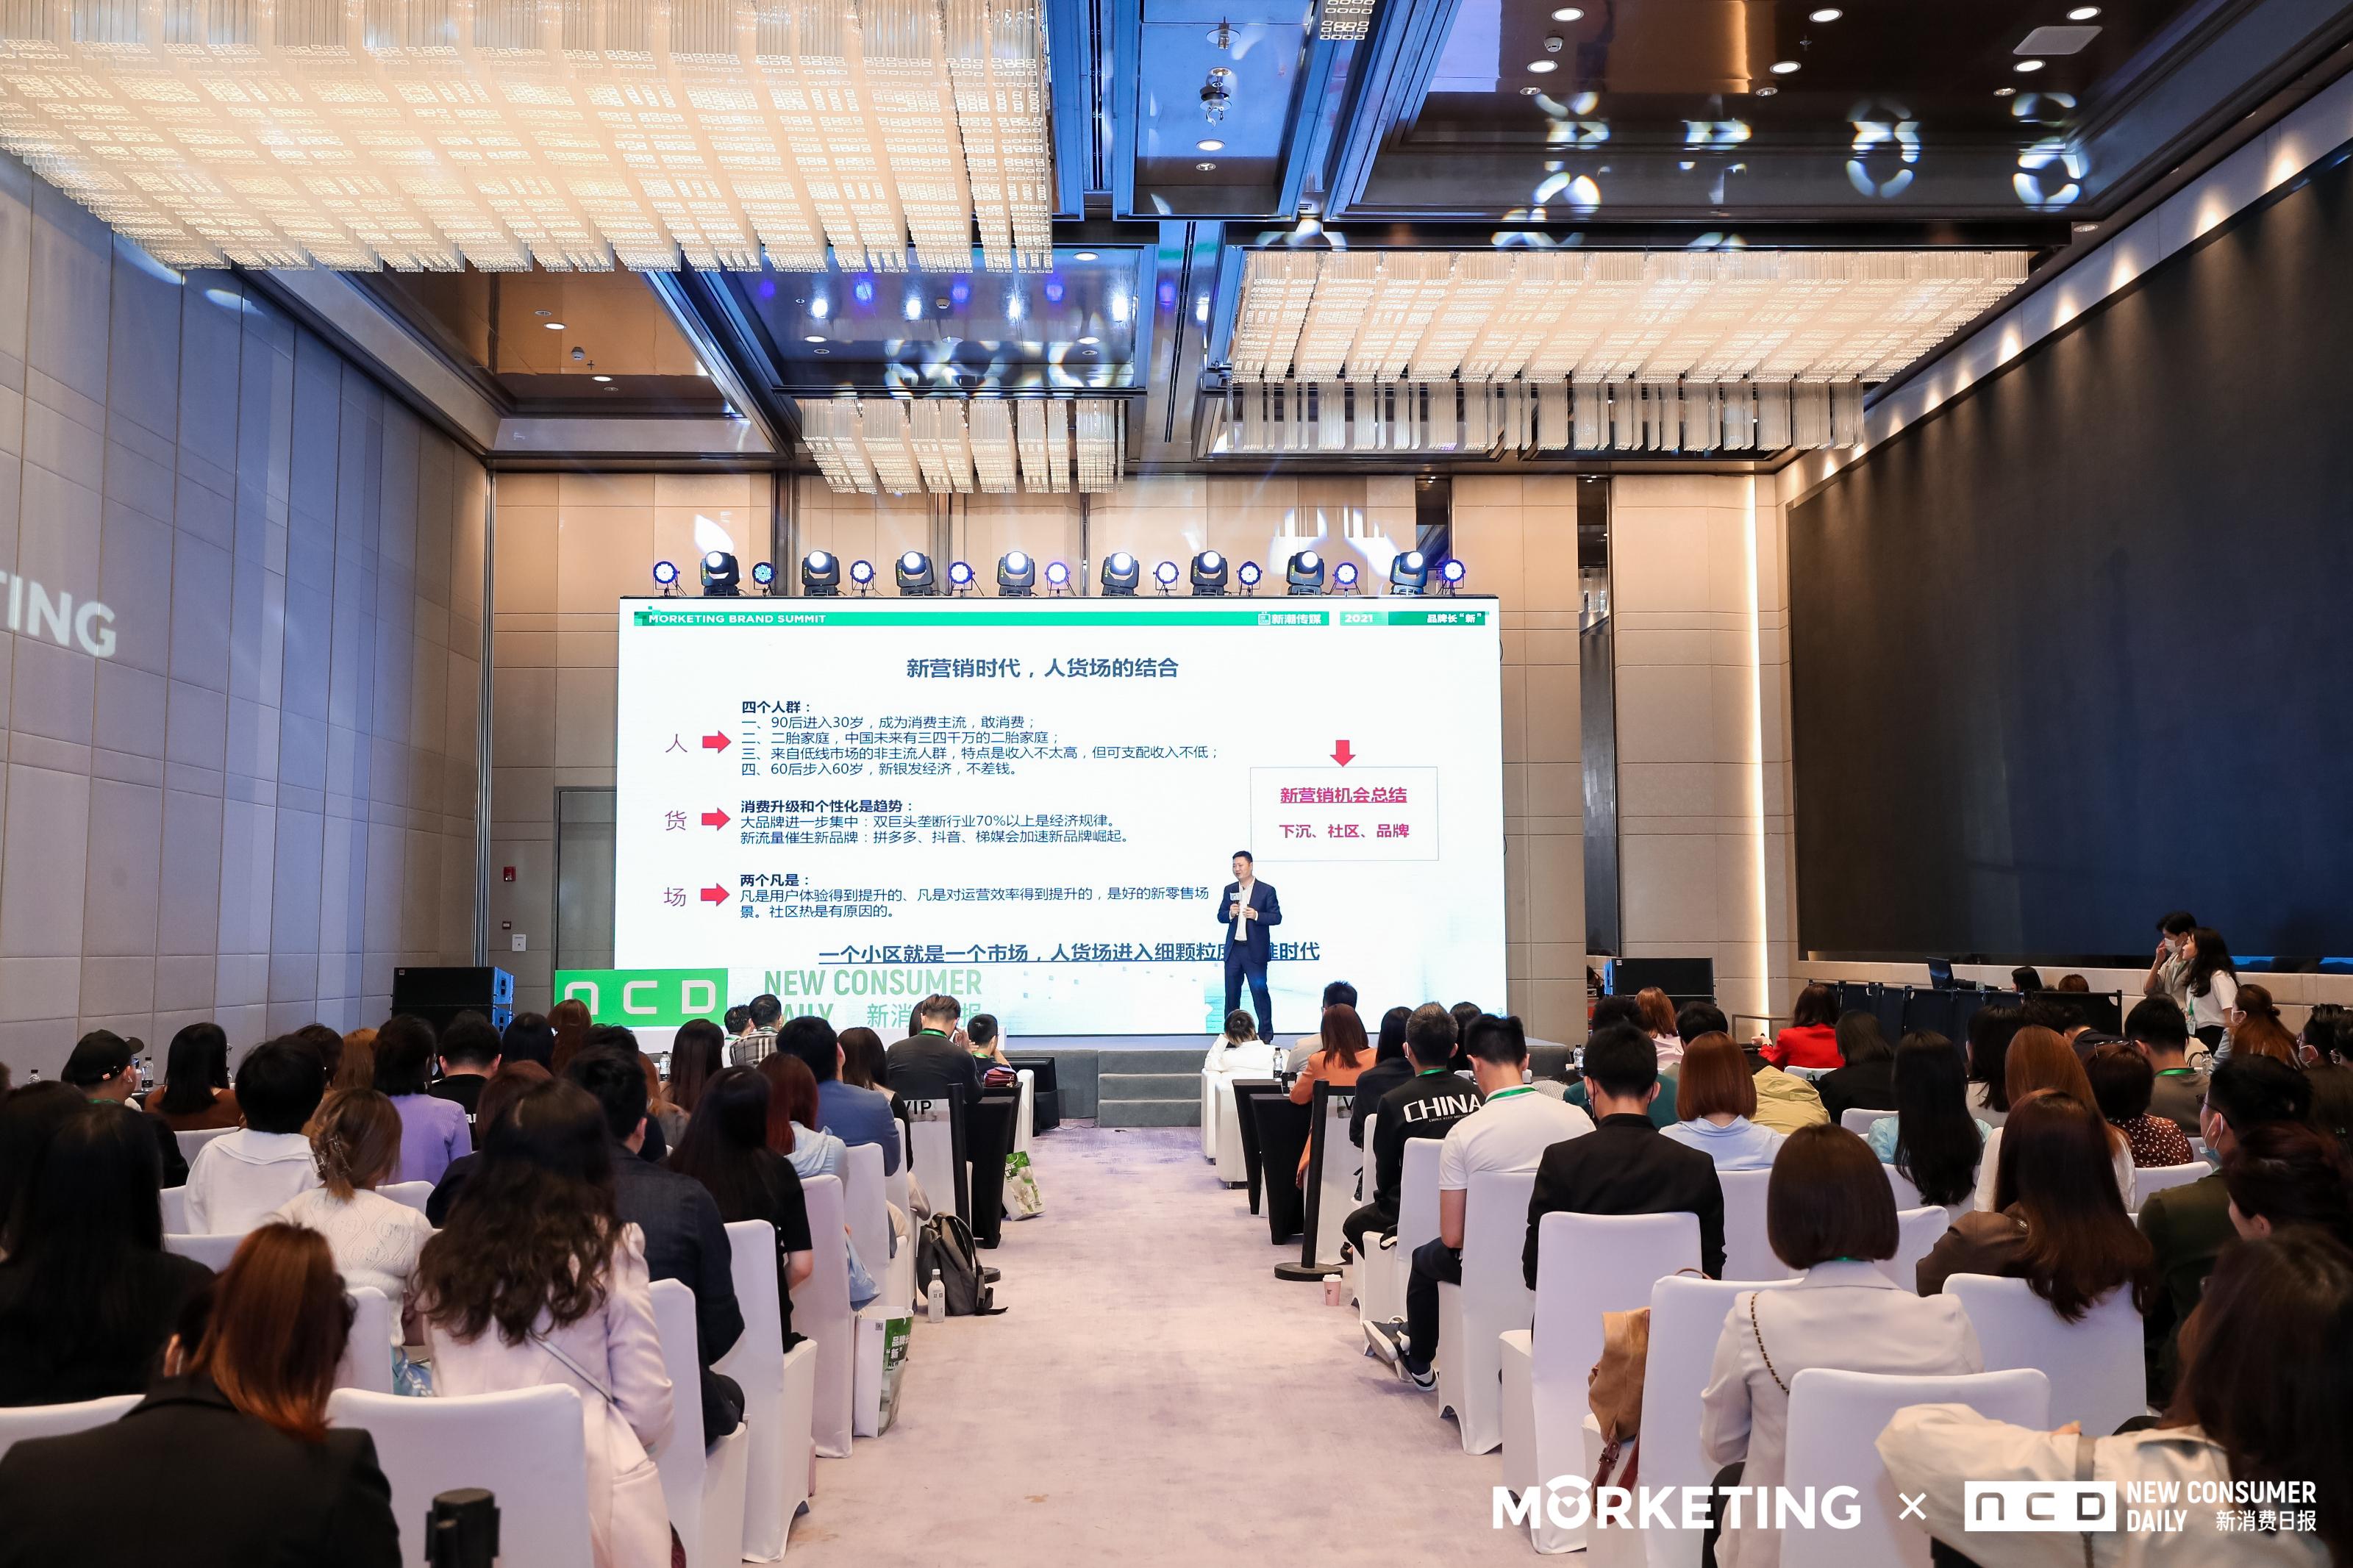 Morketing2021 | 新潮傳媒解碼社區營銷,驅動品牌增長破圈